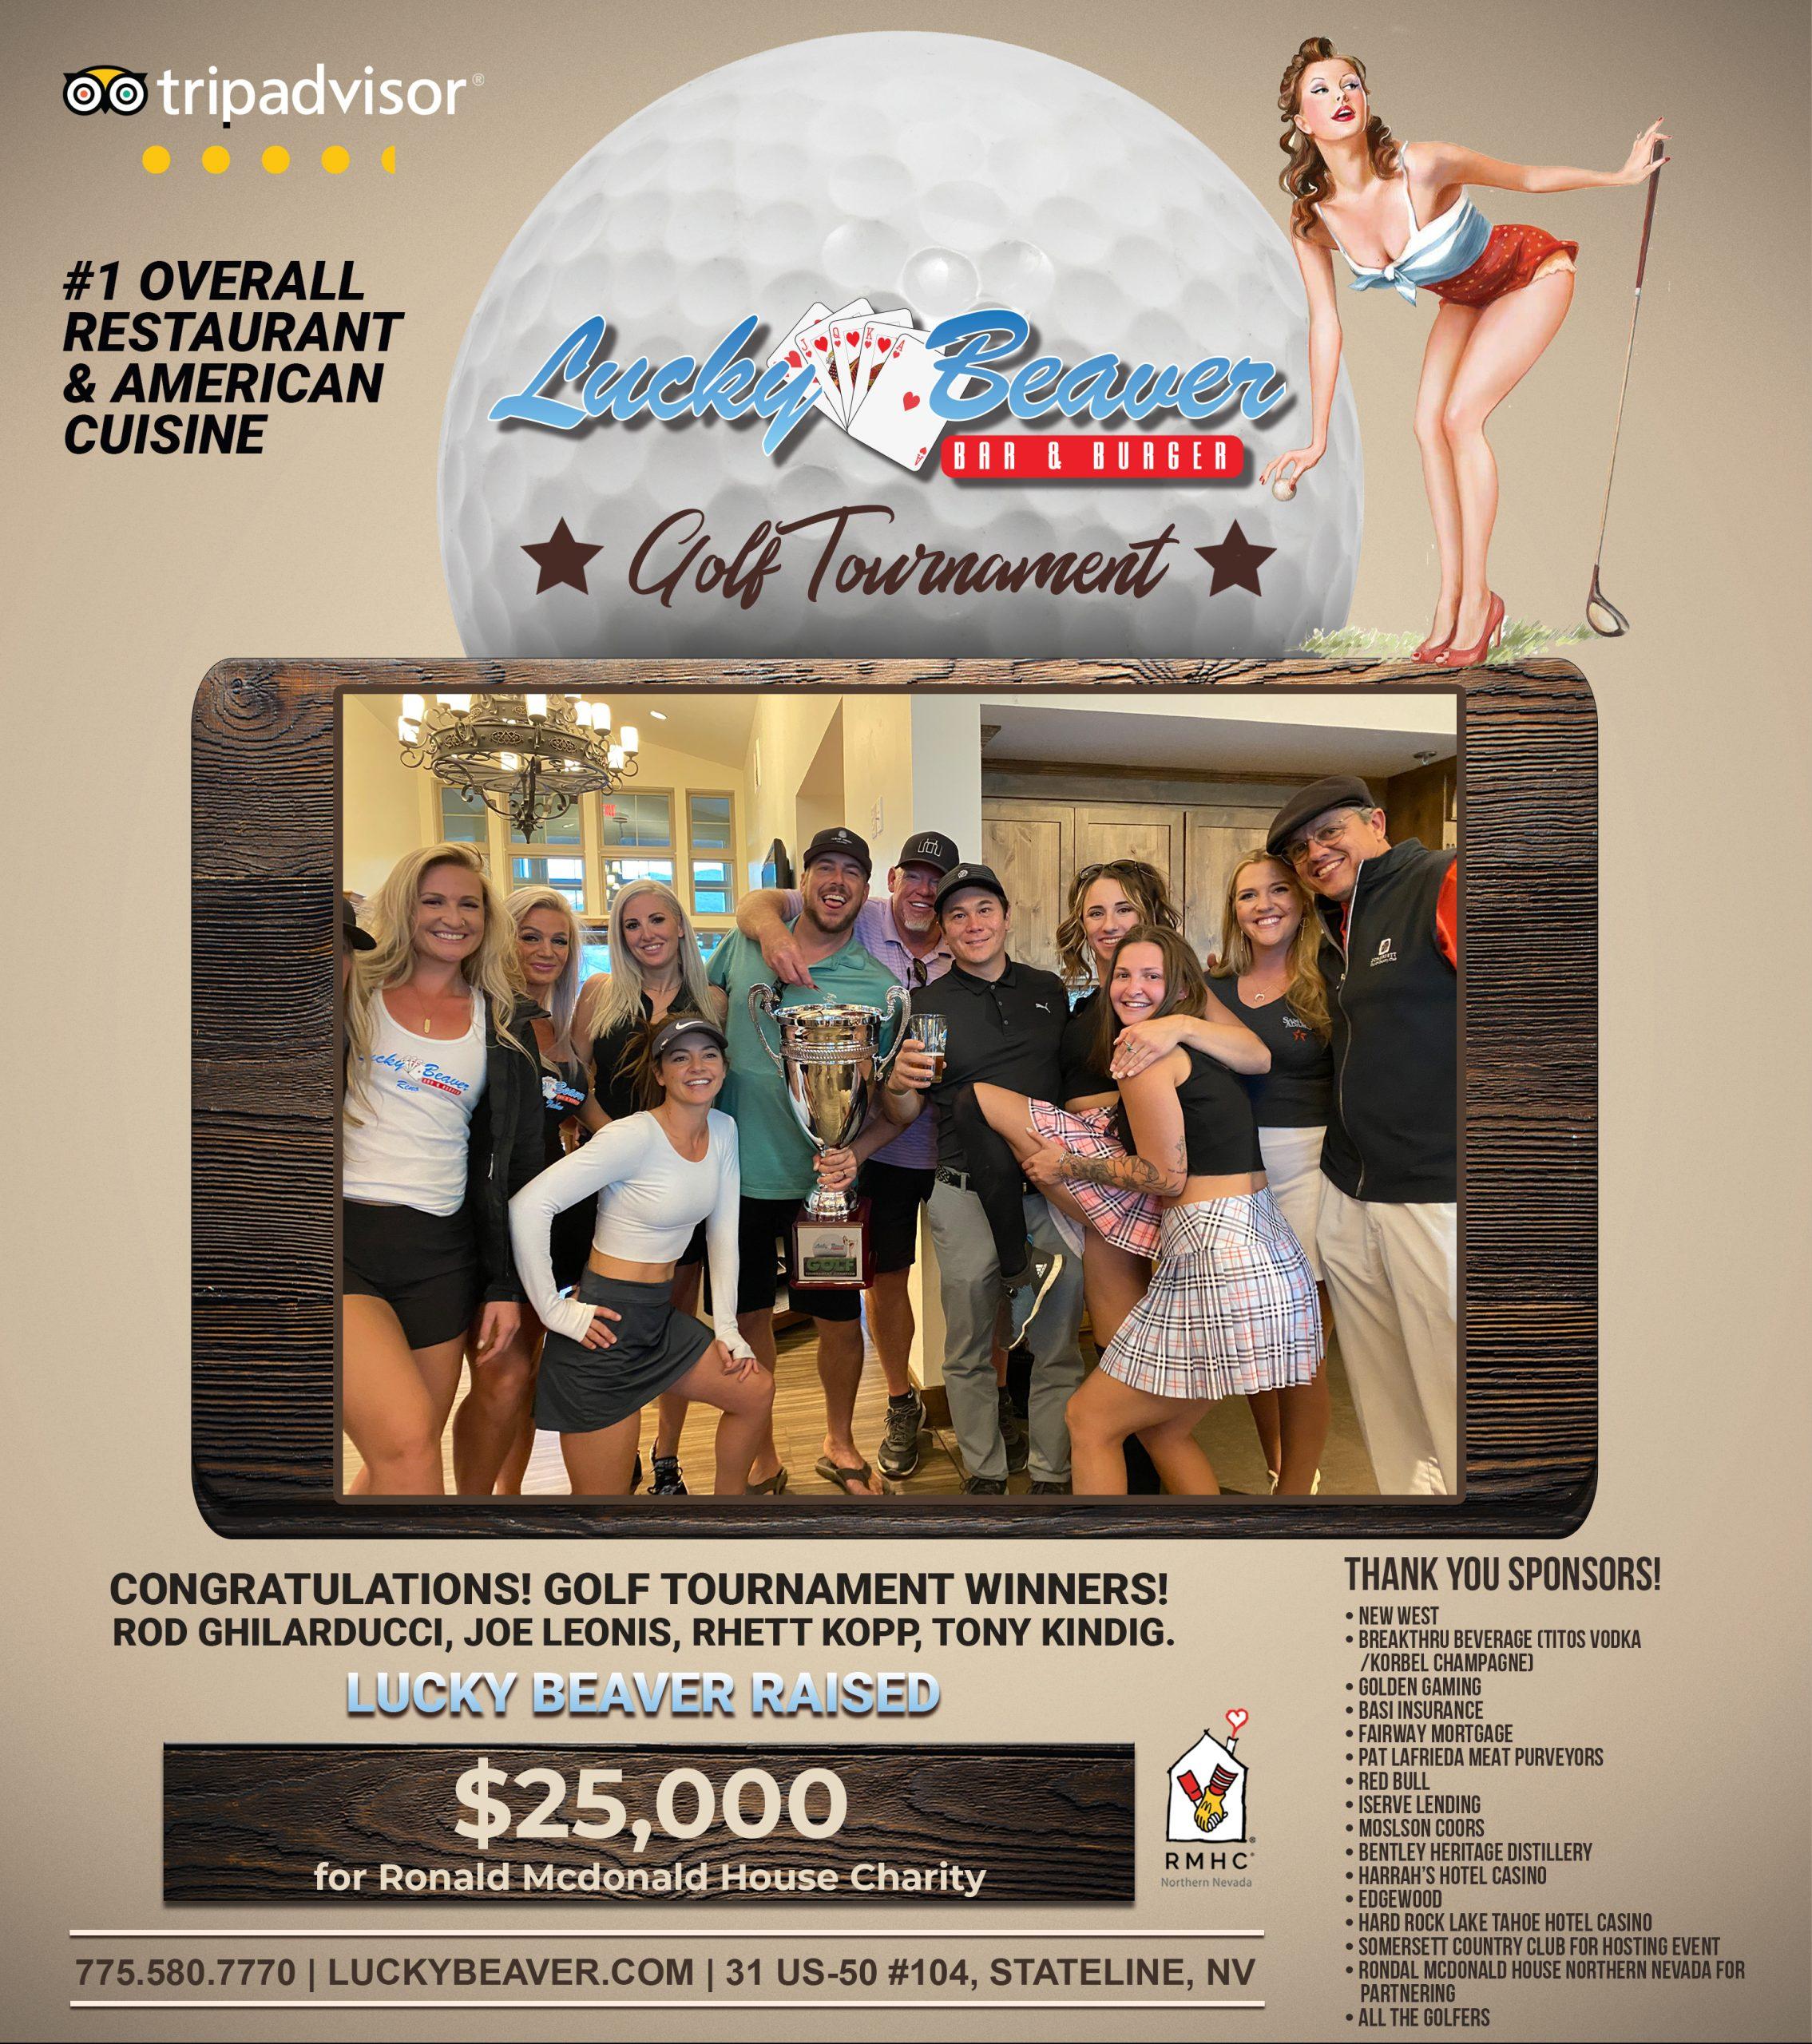 Lucky Beaver Golf Tournament raised $25,000